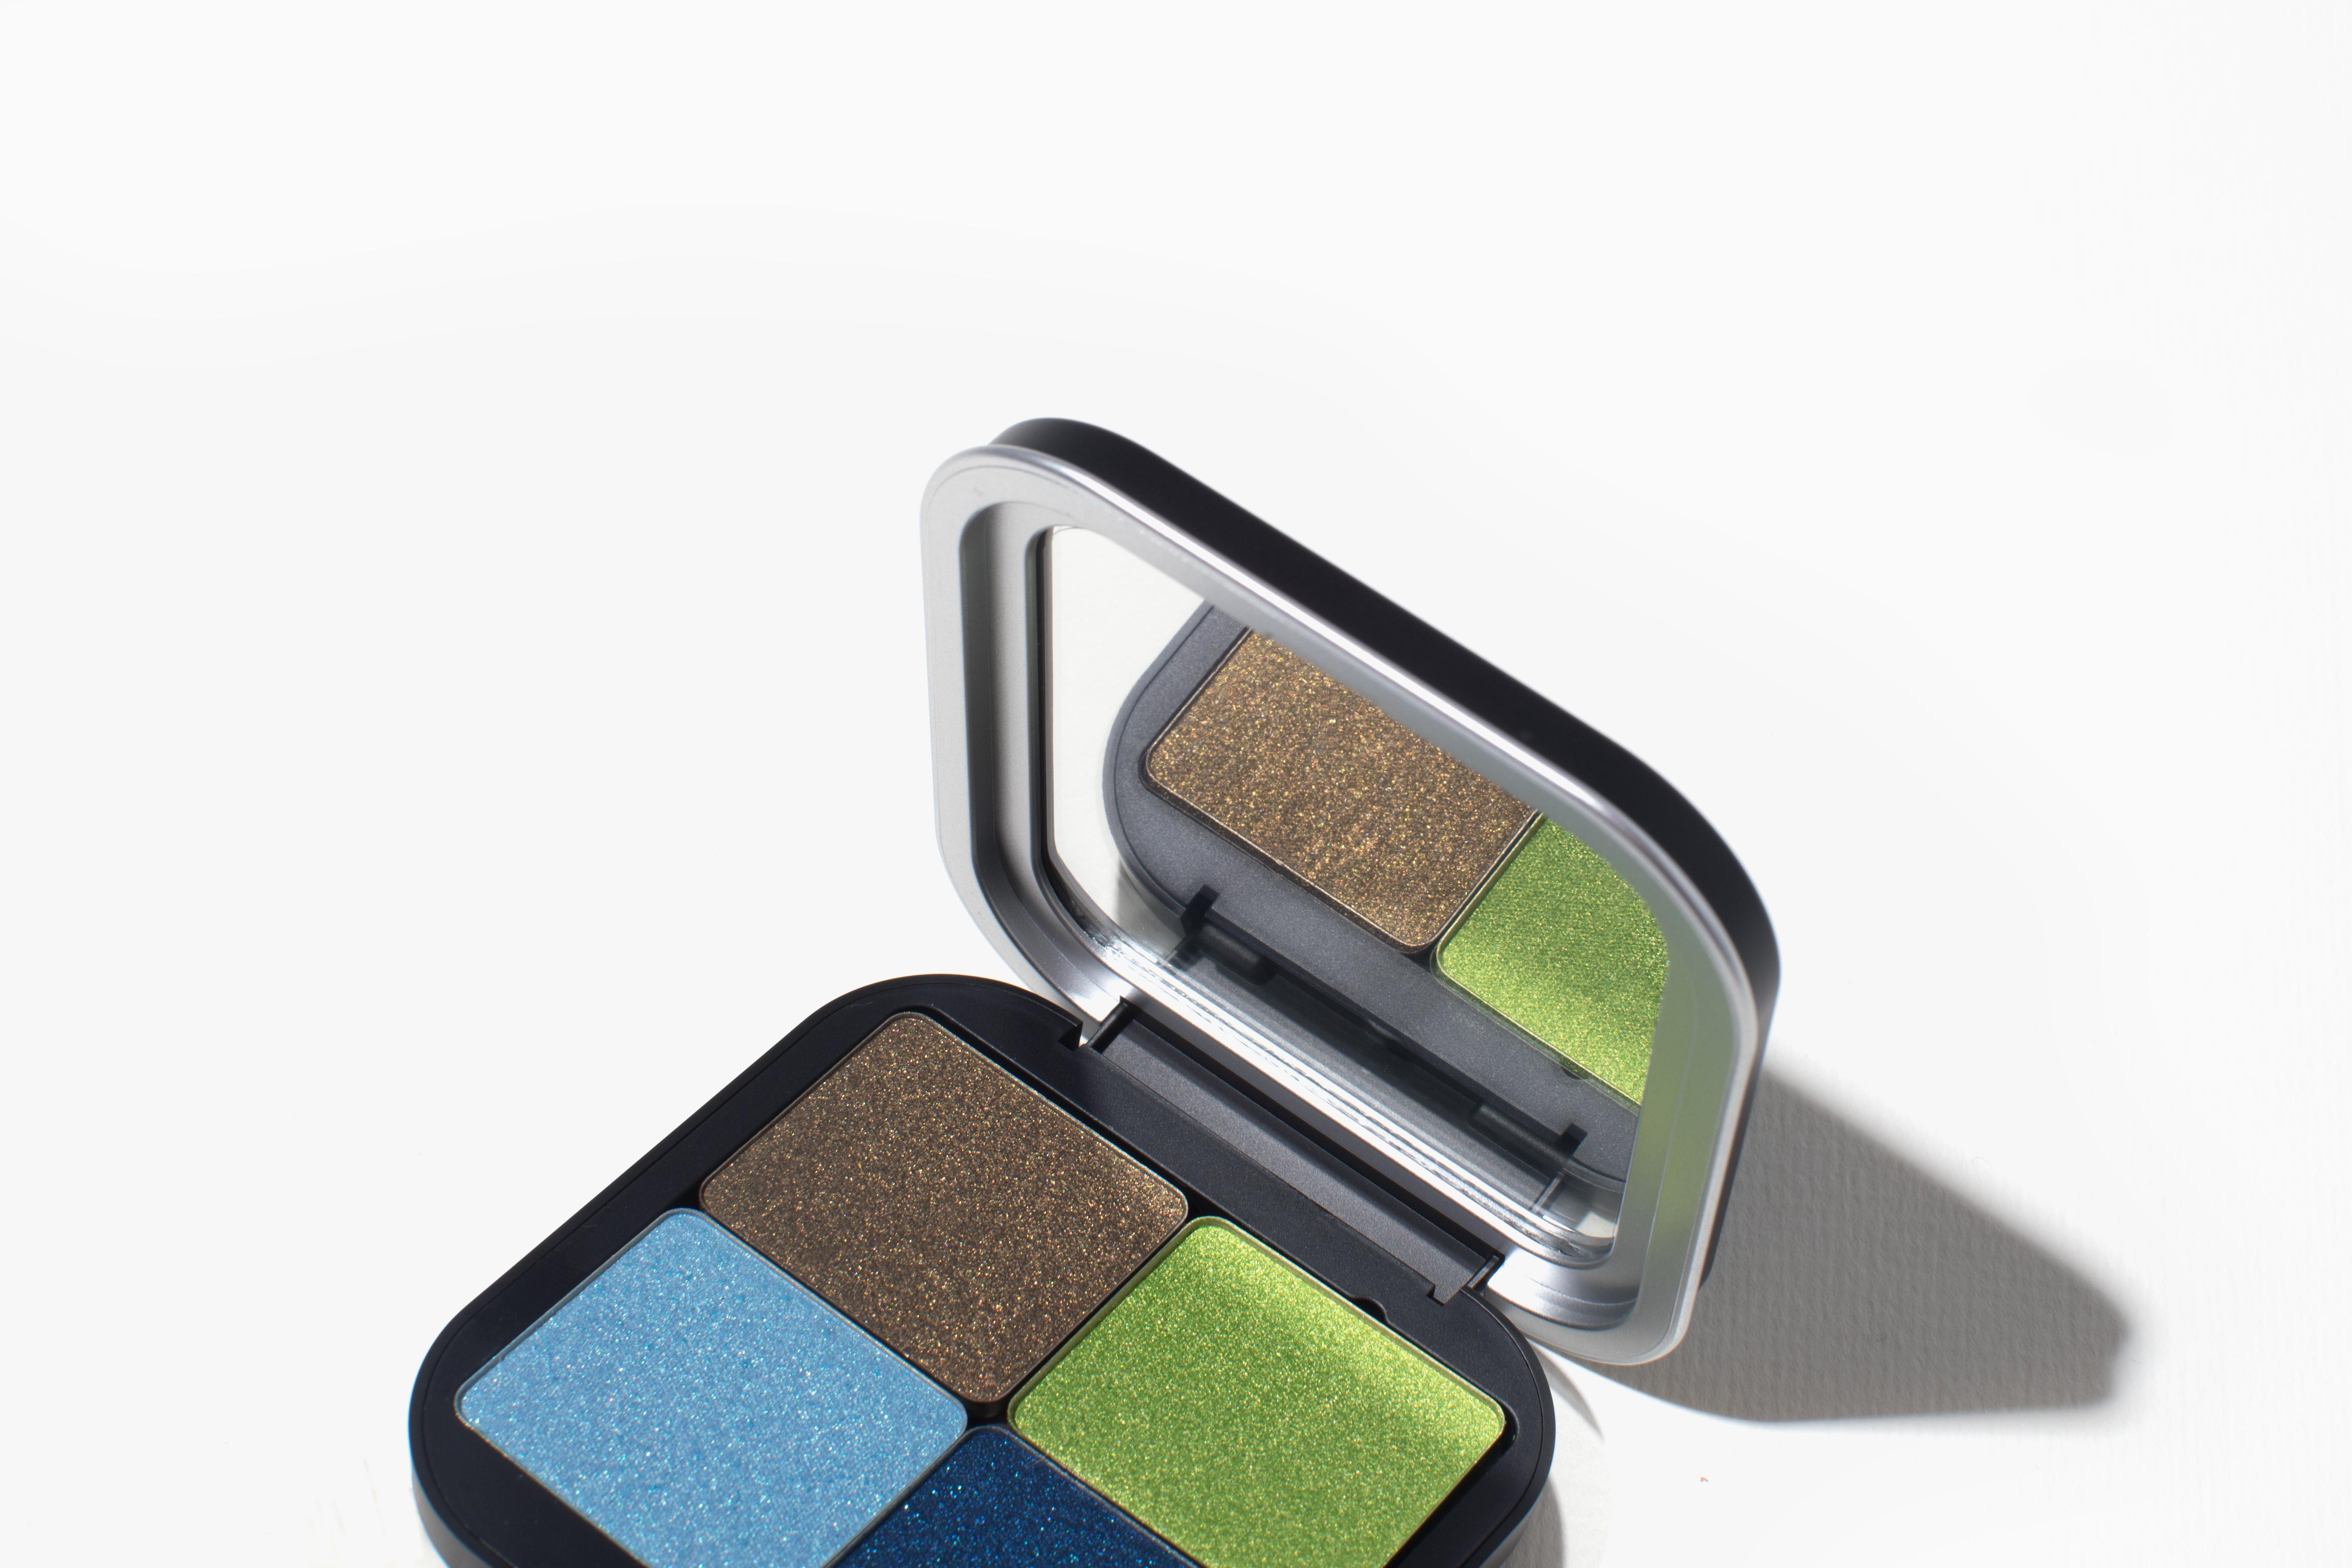 Тени Artist Color Shadow от Make Up For Ever — выбор Buro 24/7 (фото 2)